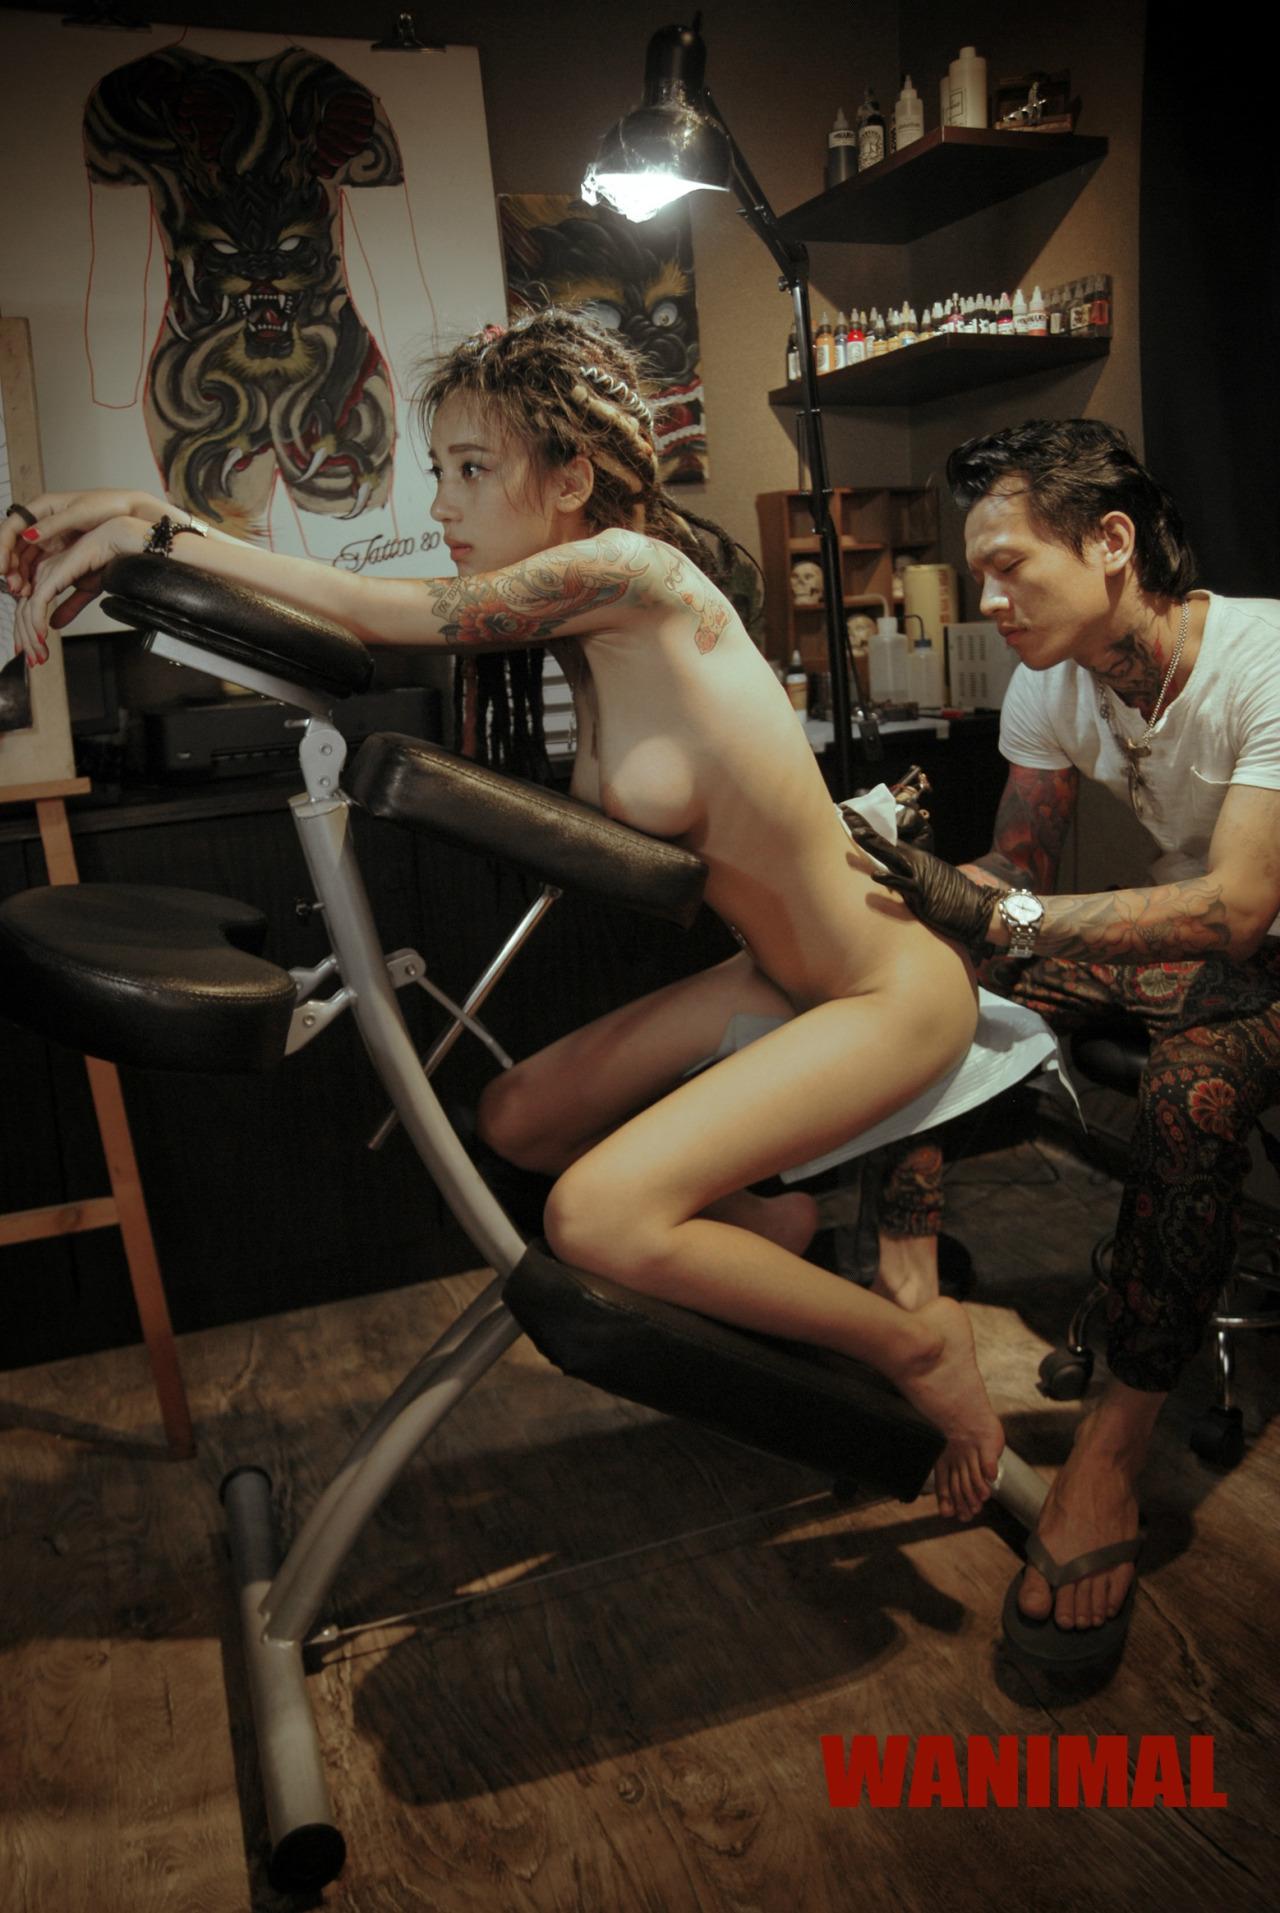 wanimal-tetovalas.jpg